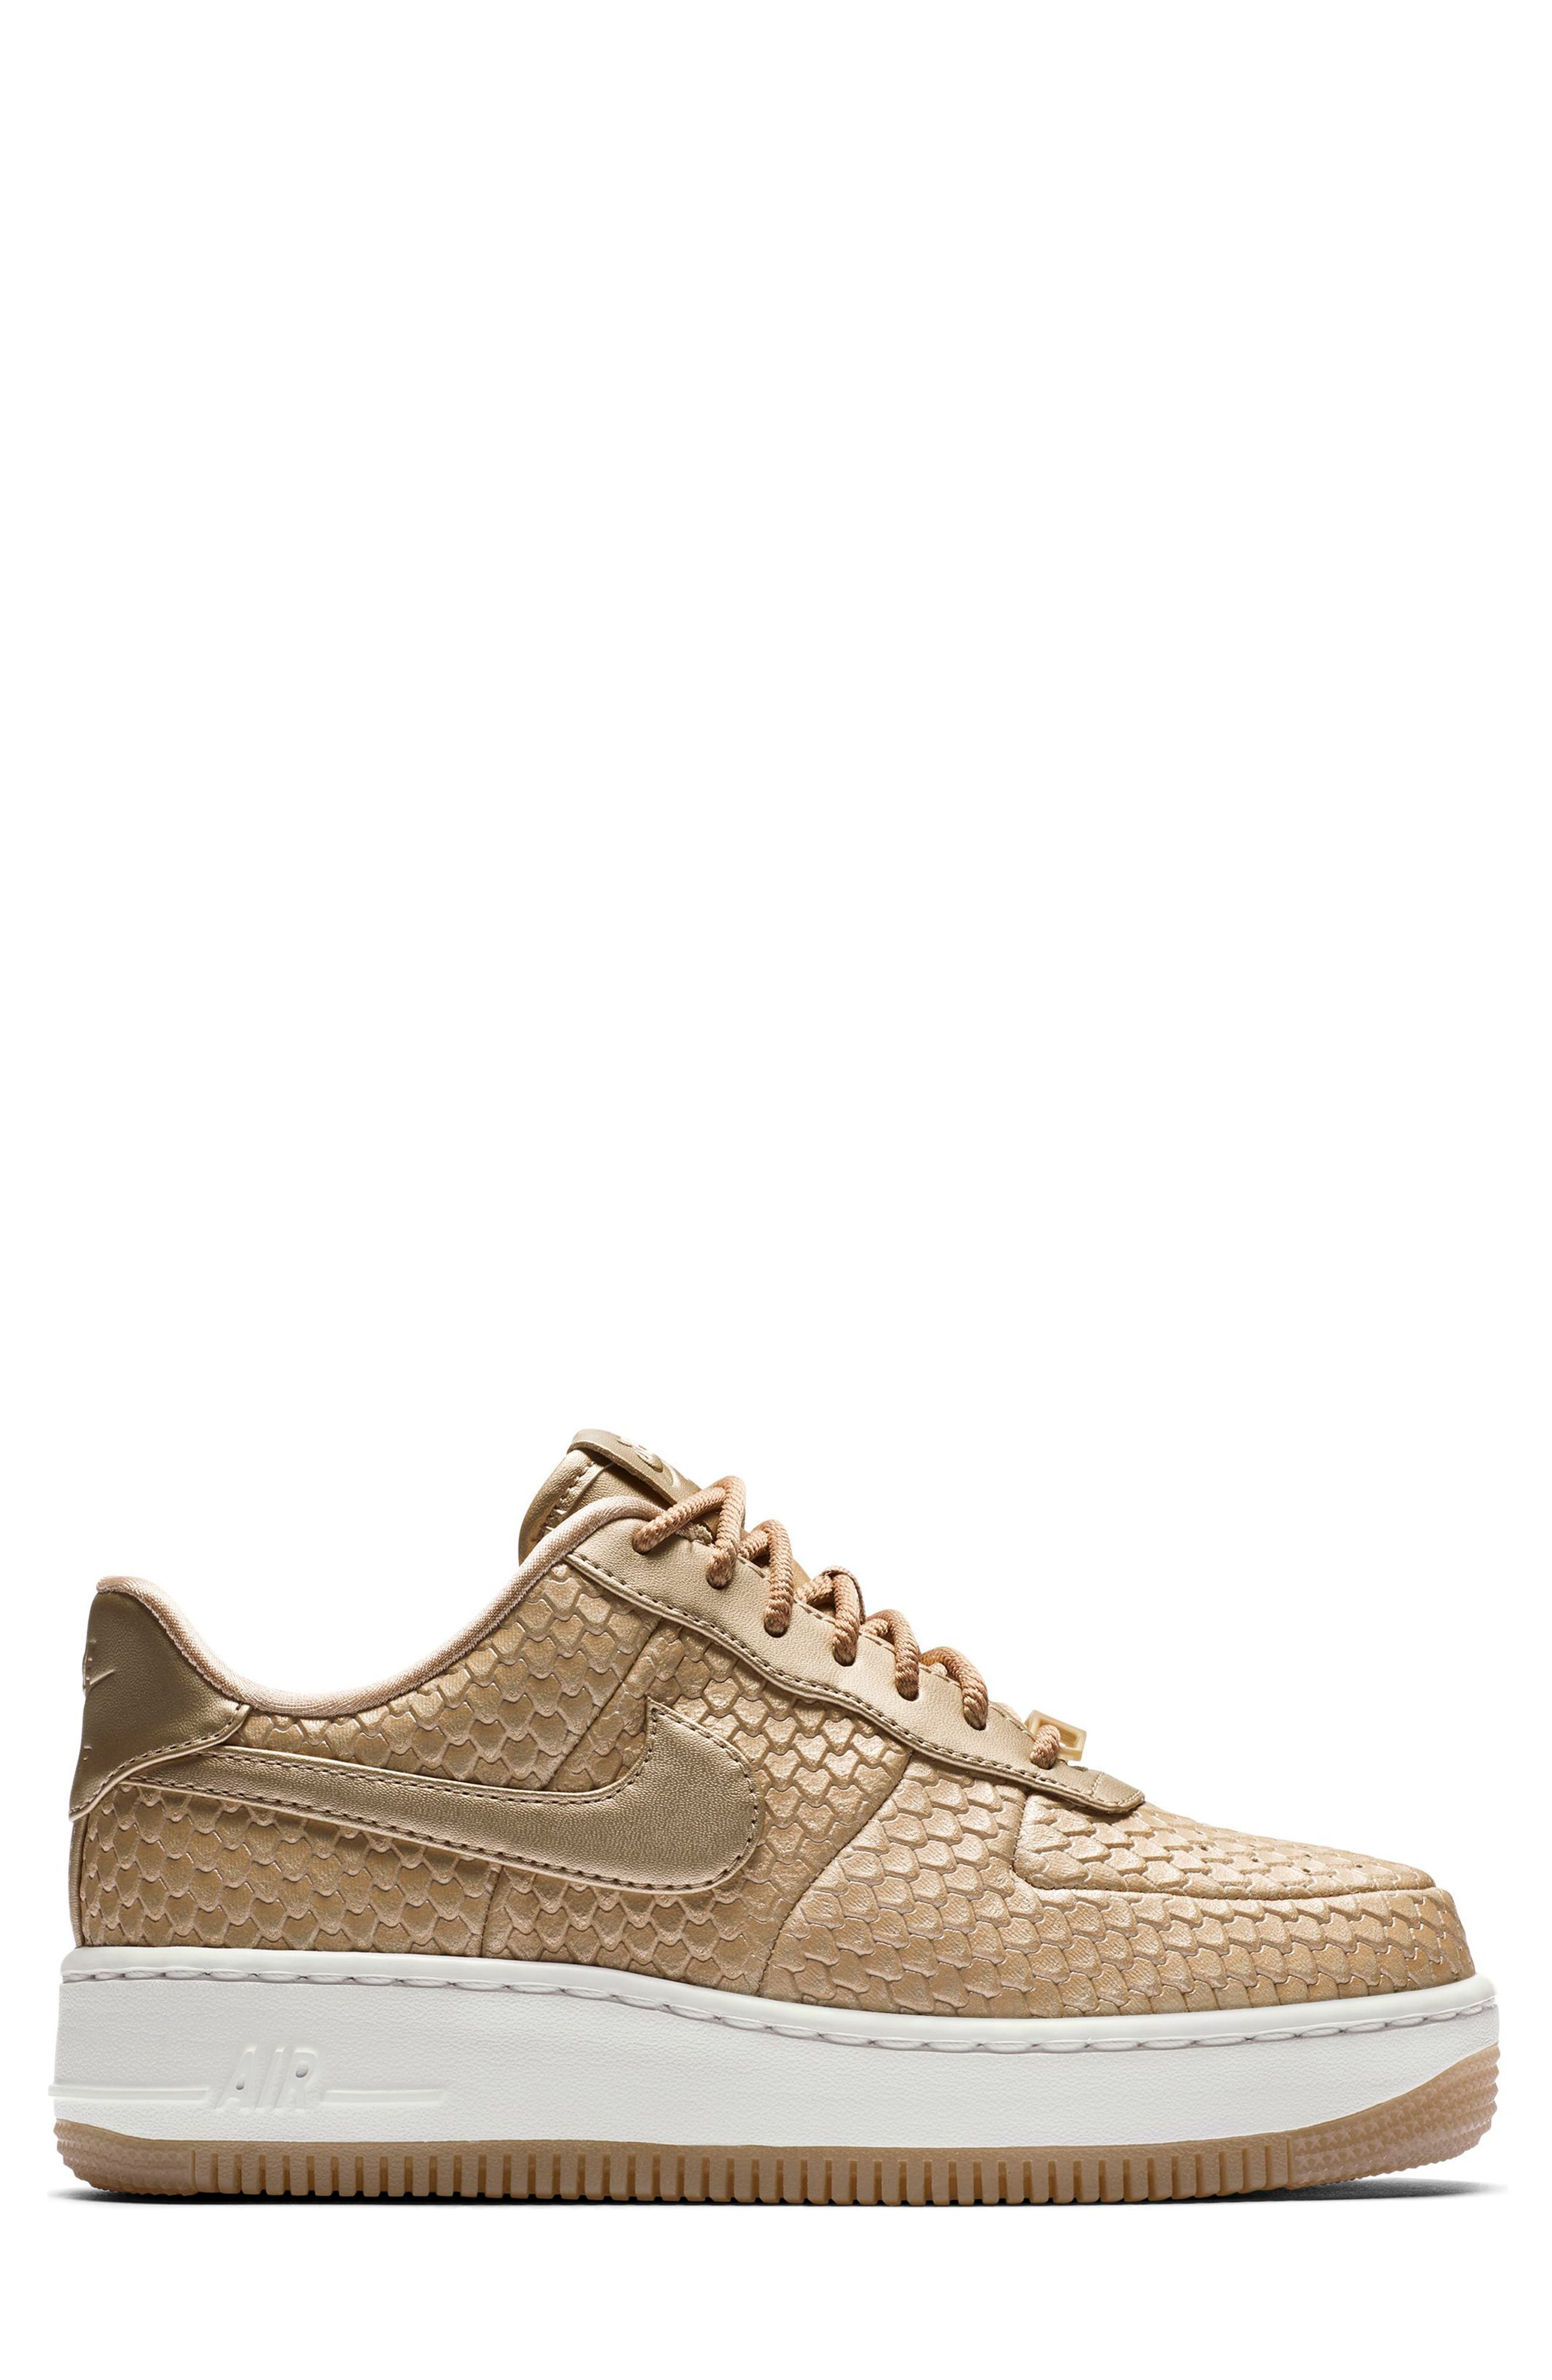 Air Force 1 Upstep Premium Platform Sneaker,                             Alternate thumbnail 5, color,                             Blur/ Blur/ Summit White